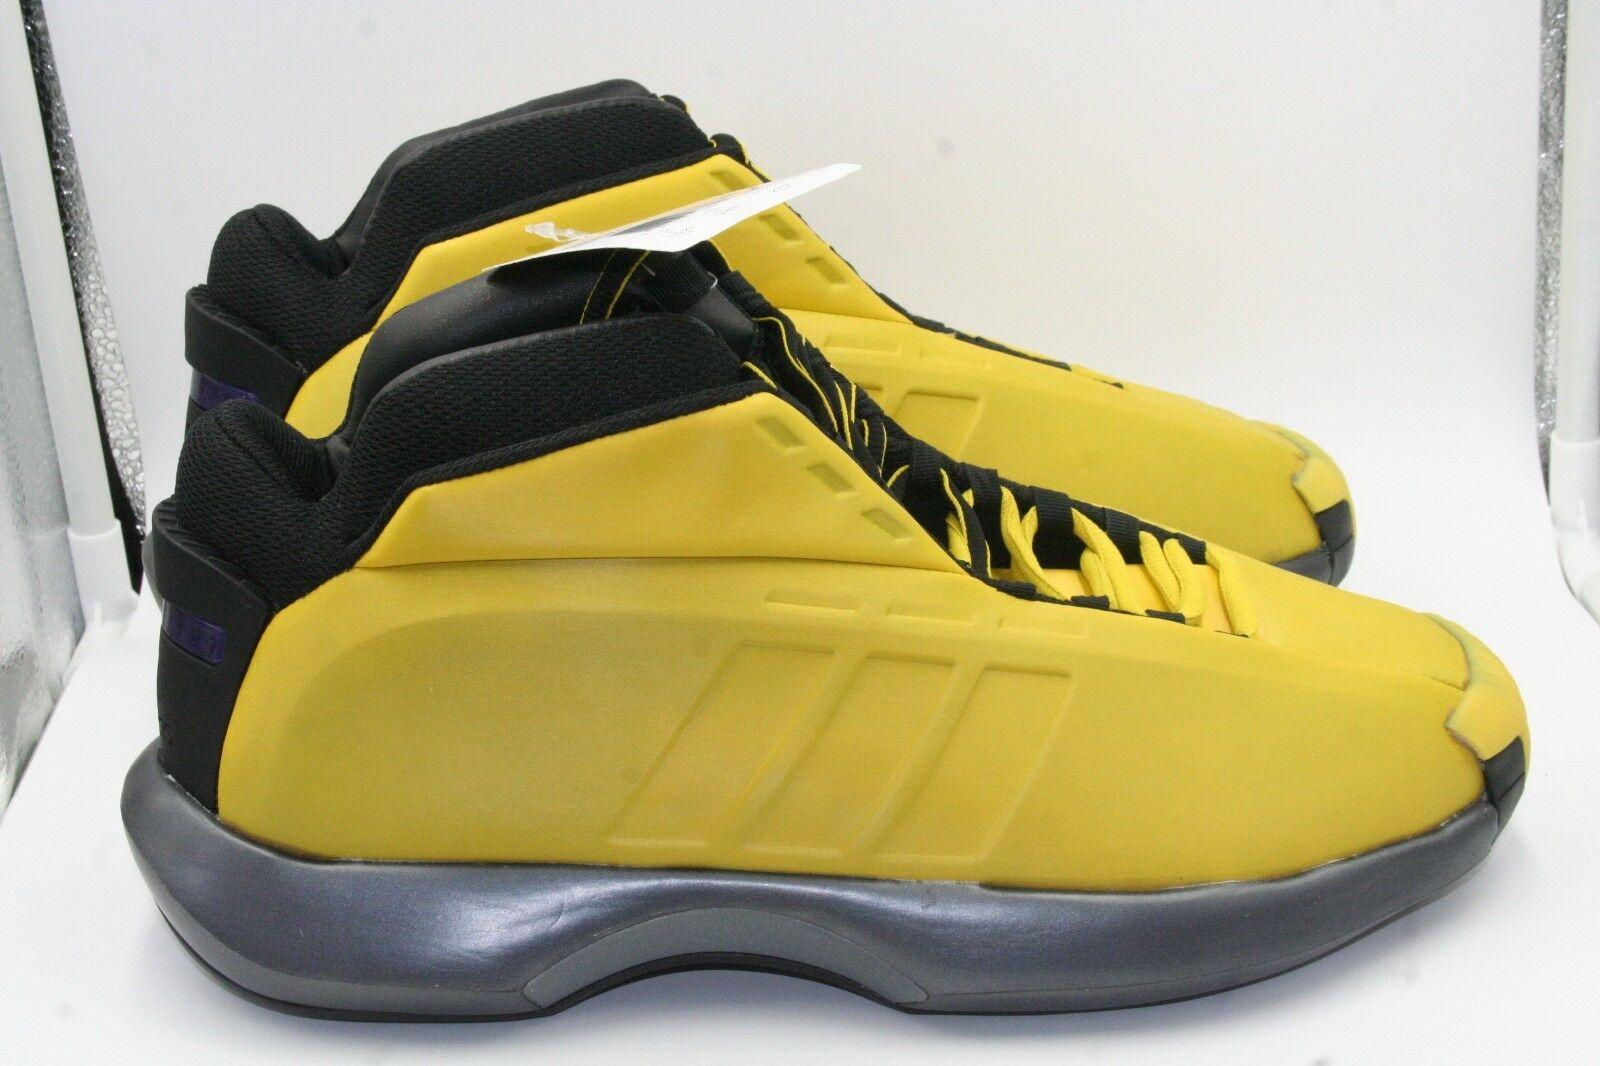 Adidas Crazy 1 Sunshine Yellow DS Sz 10.5 Lakers Kobe